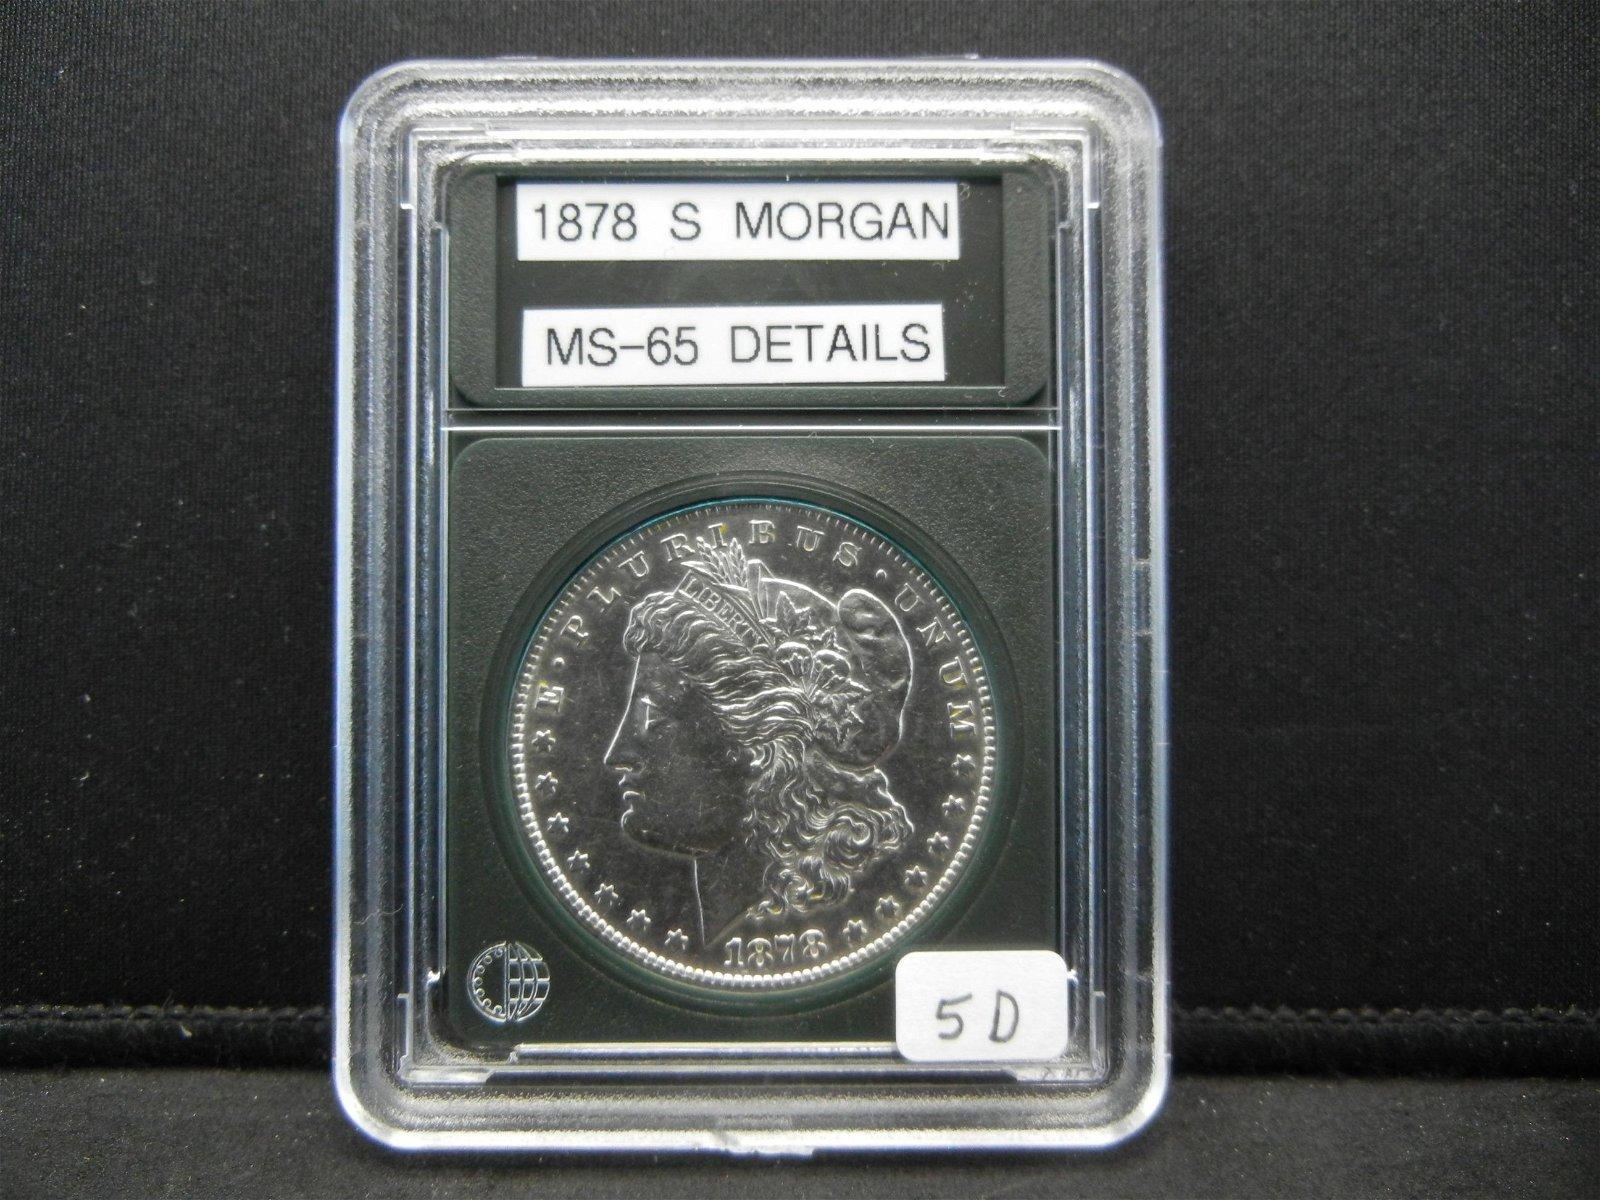 1878-S Morgan Silver Dollar, Beautiful Coin, Excellent